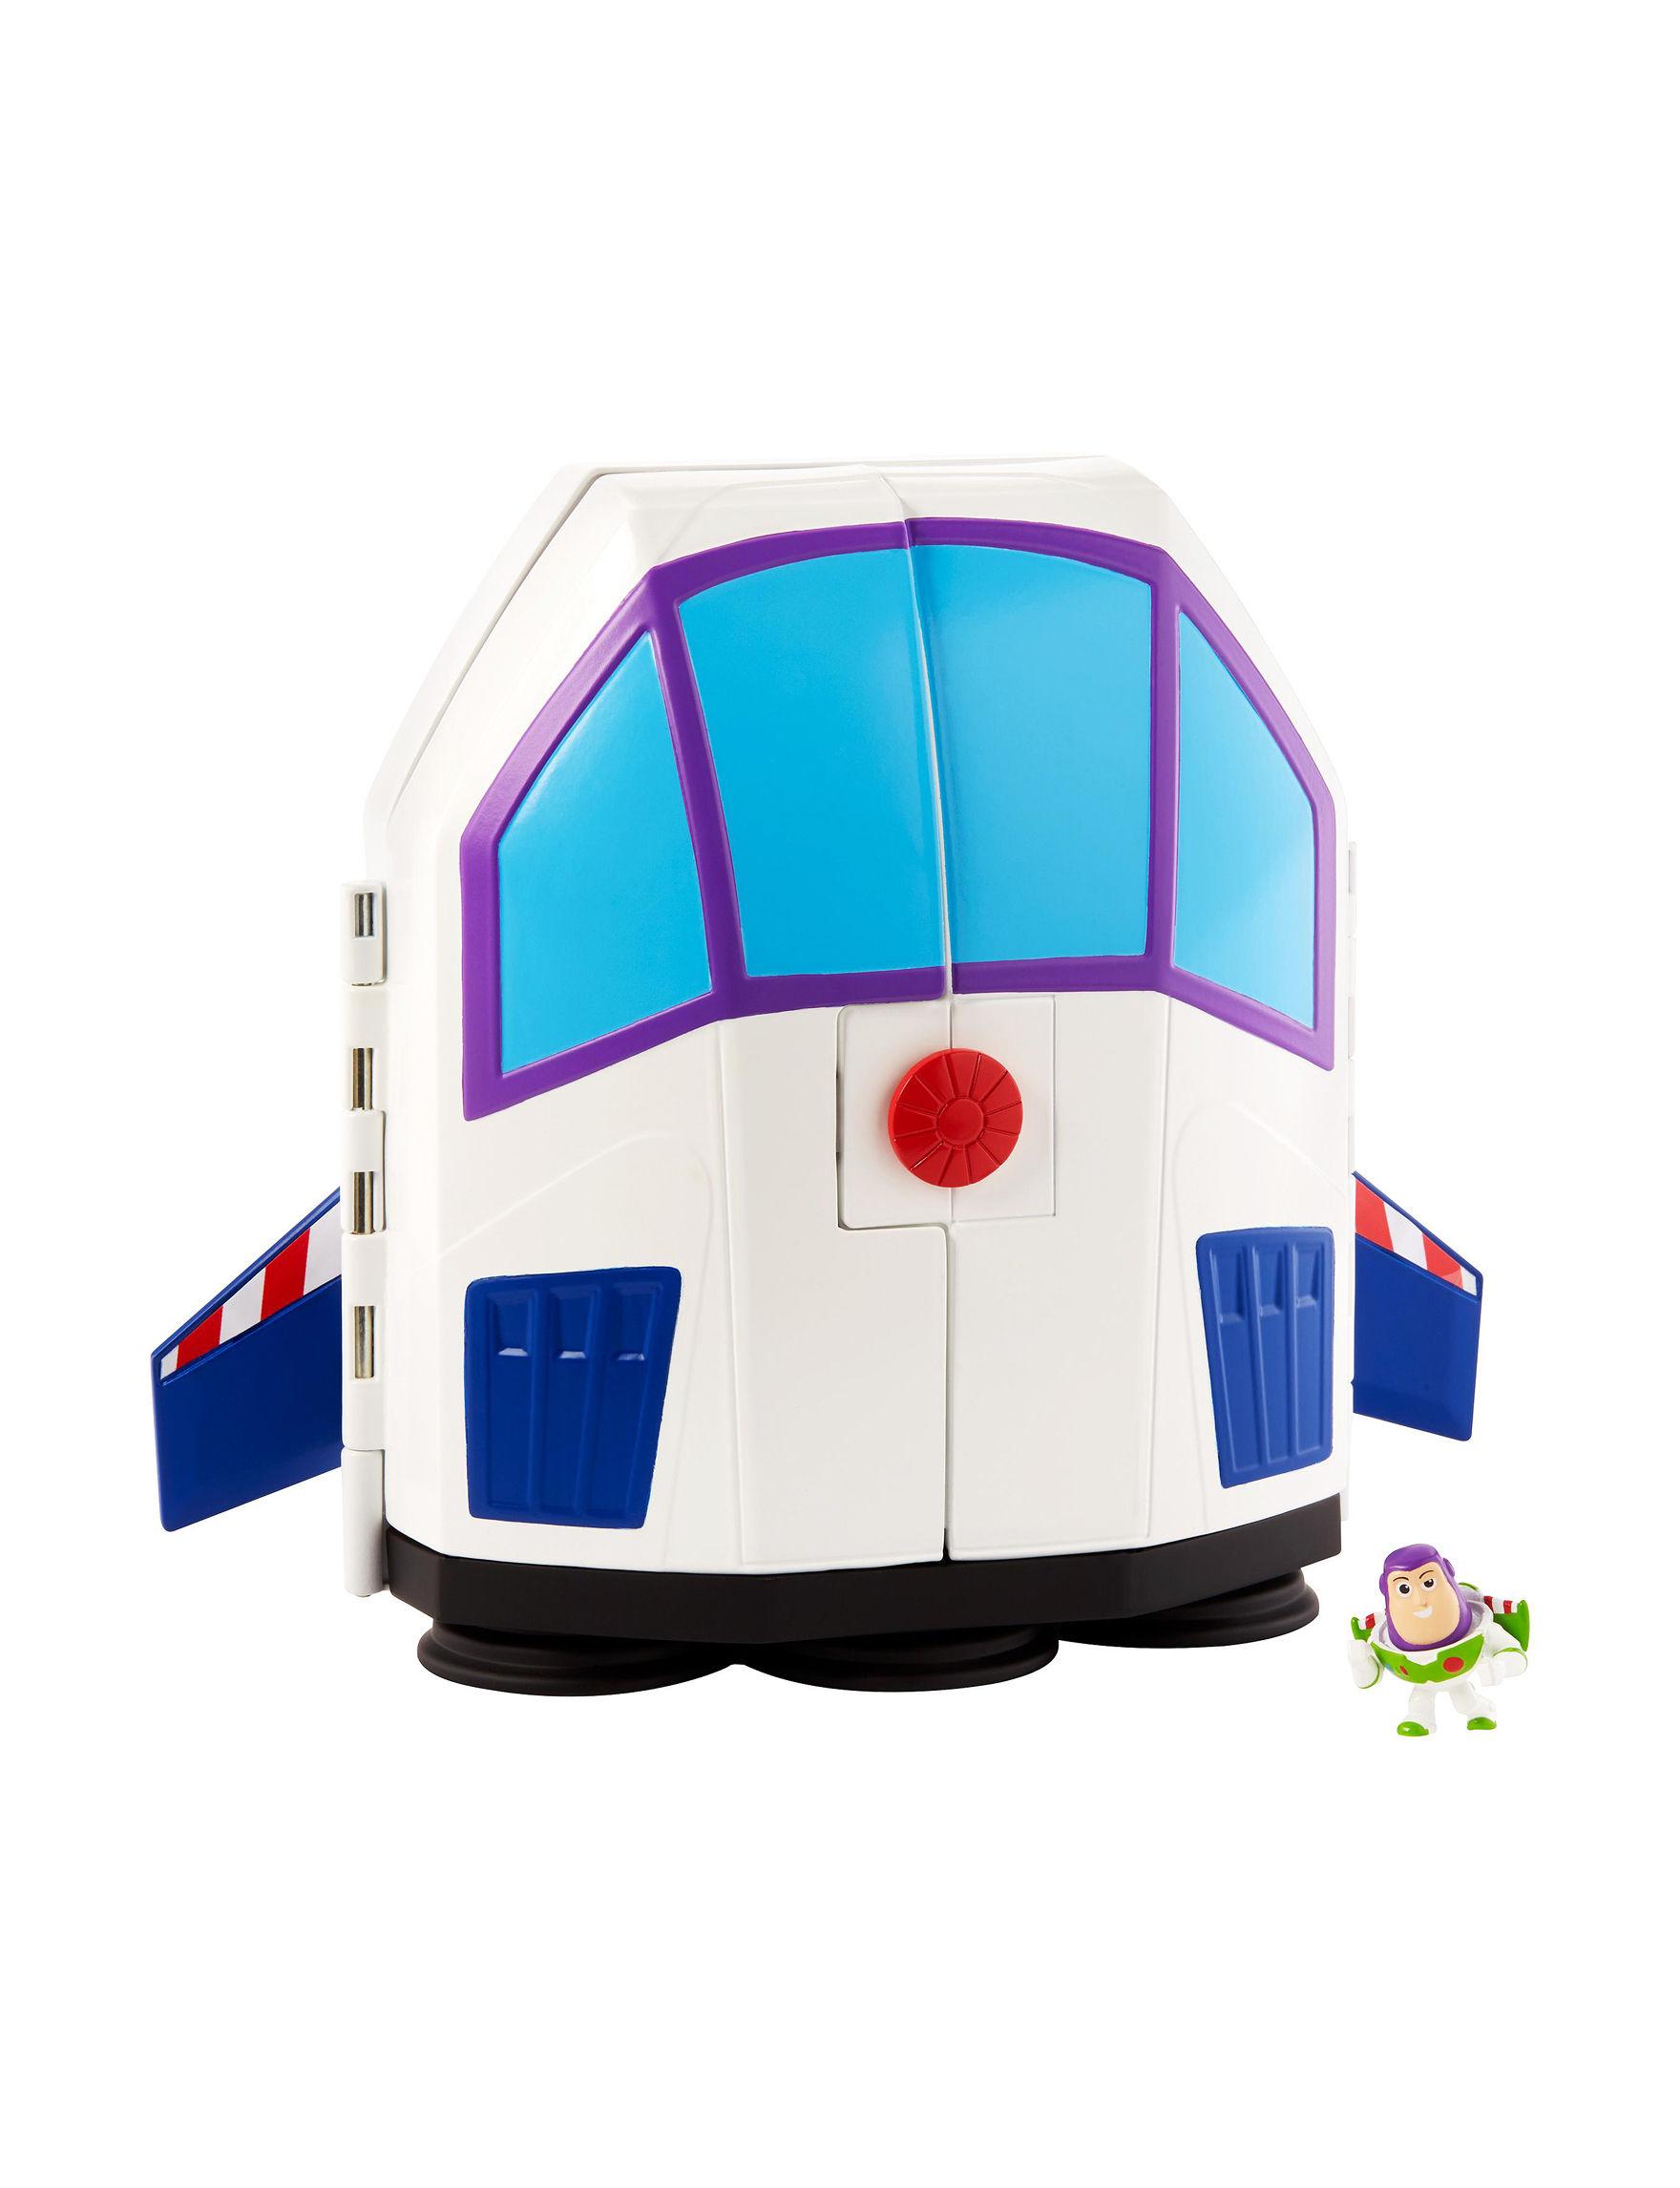 Toy Story White / Blue Multi